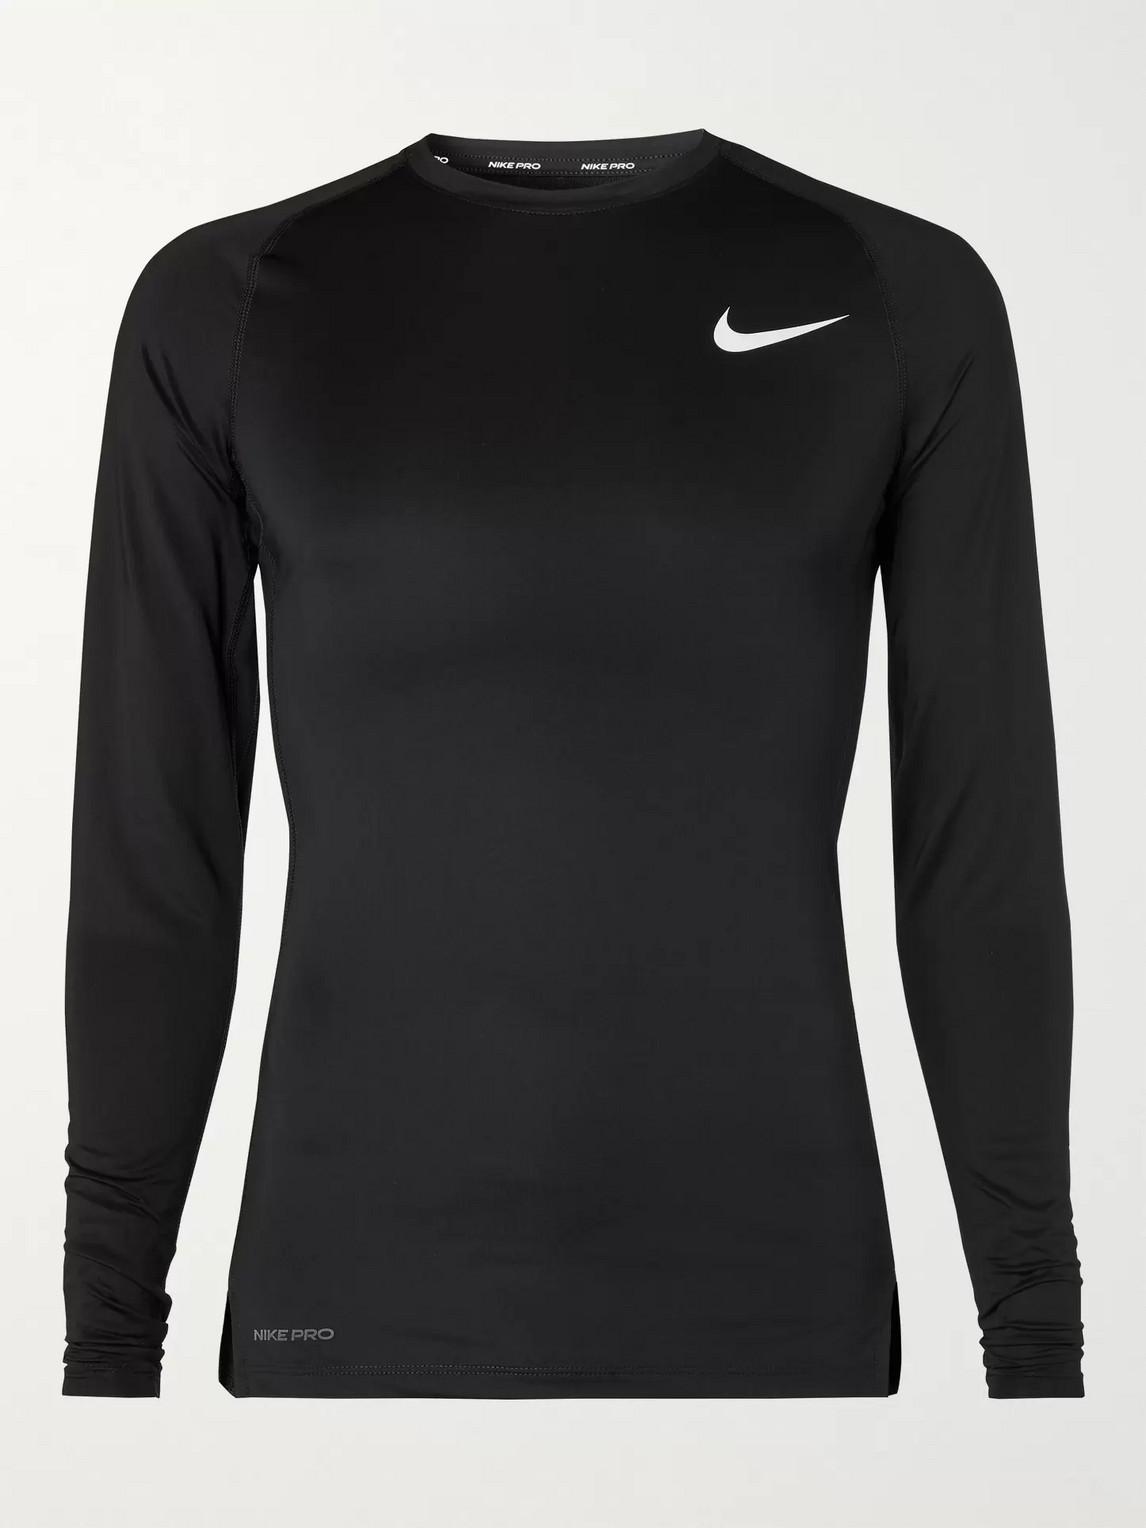 Nike Men's Pro Dri-fit Training Top In Black